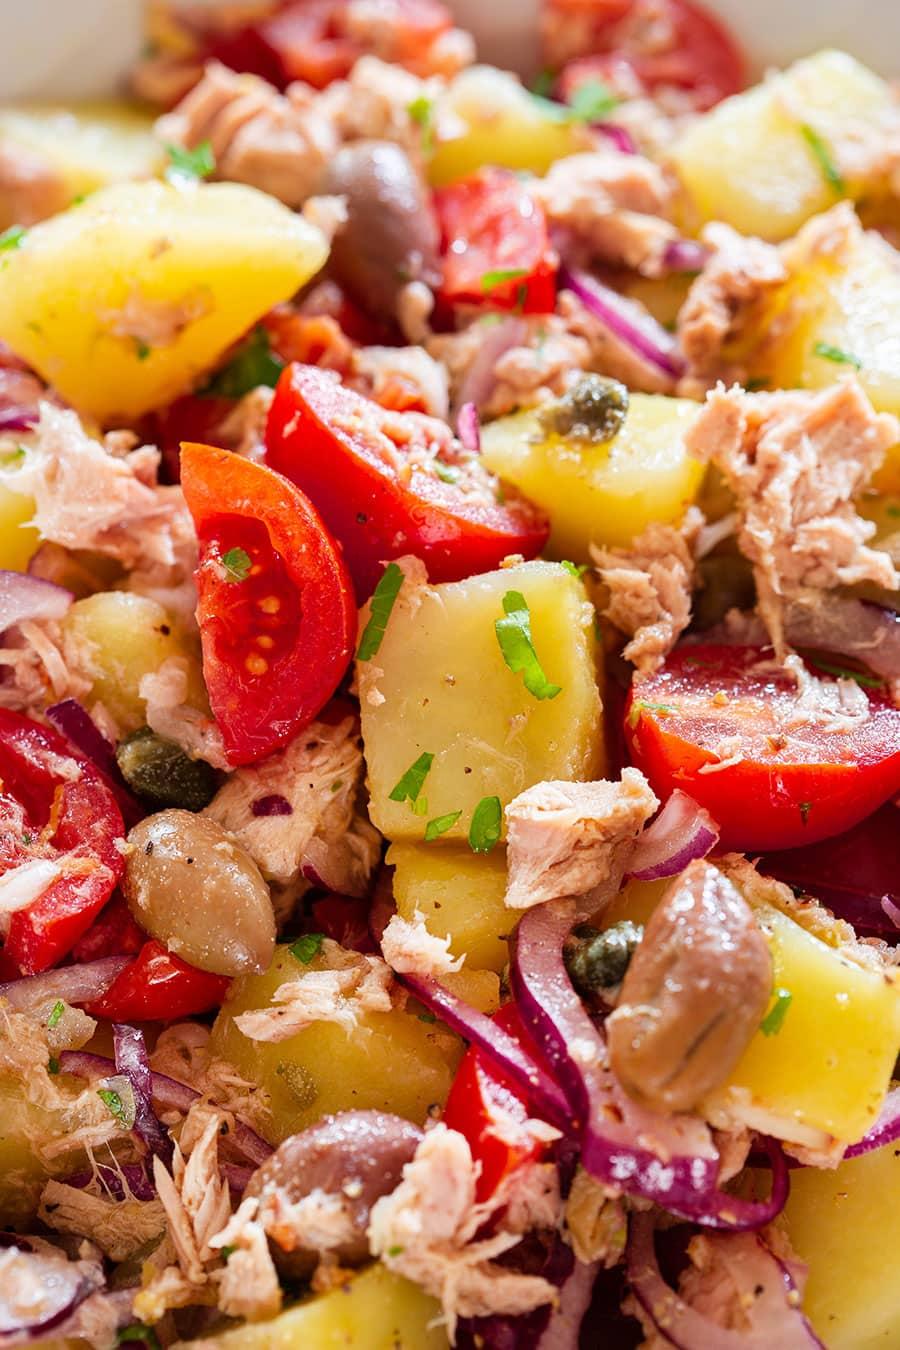 A close-up of the potato and tuna salad.